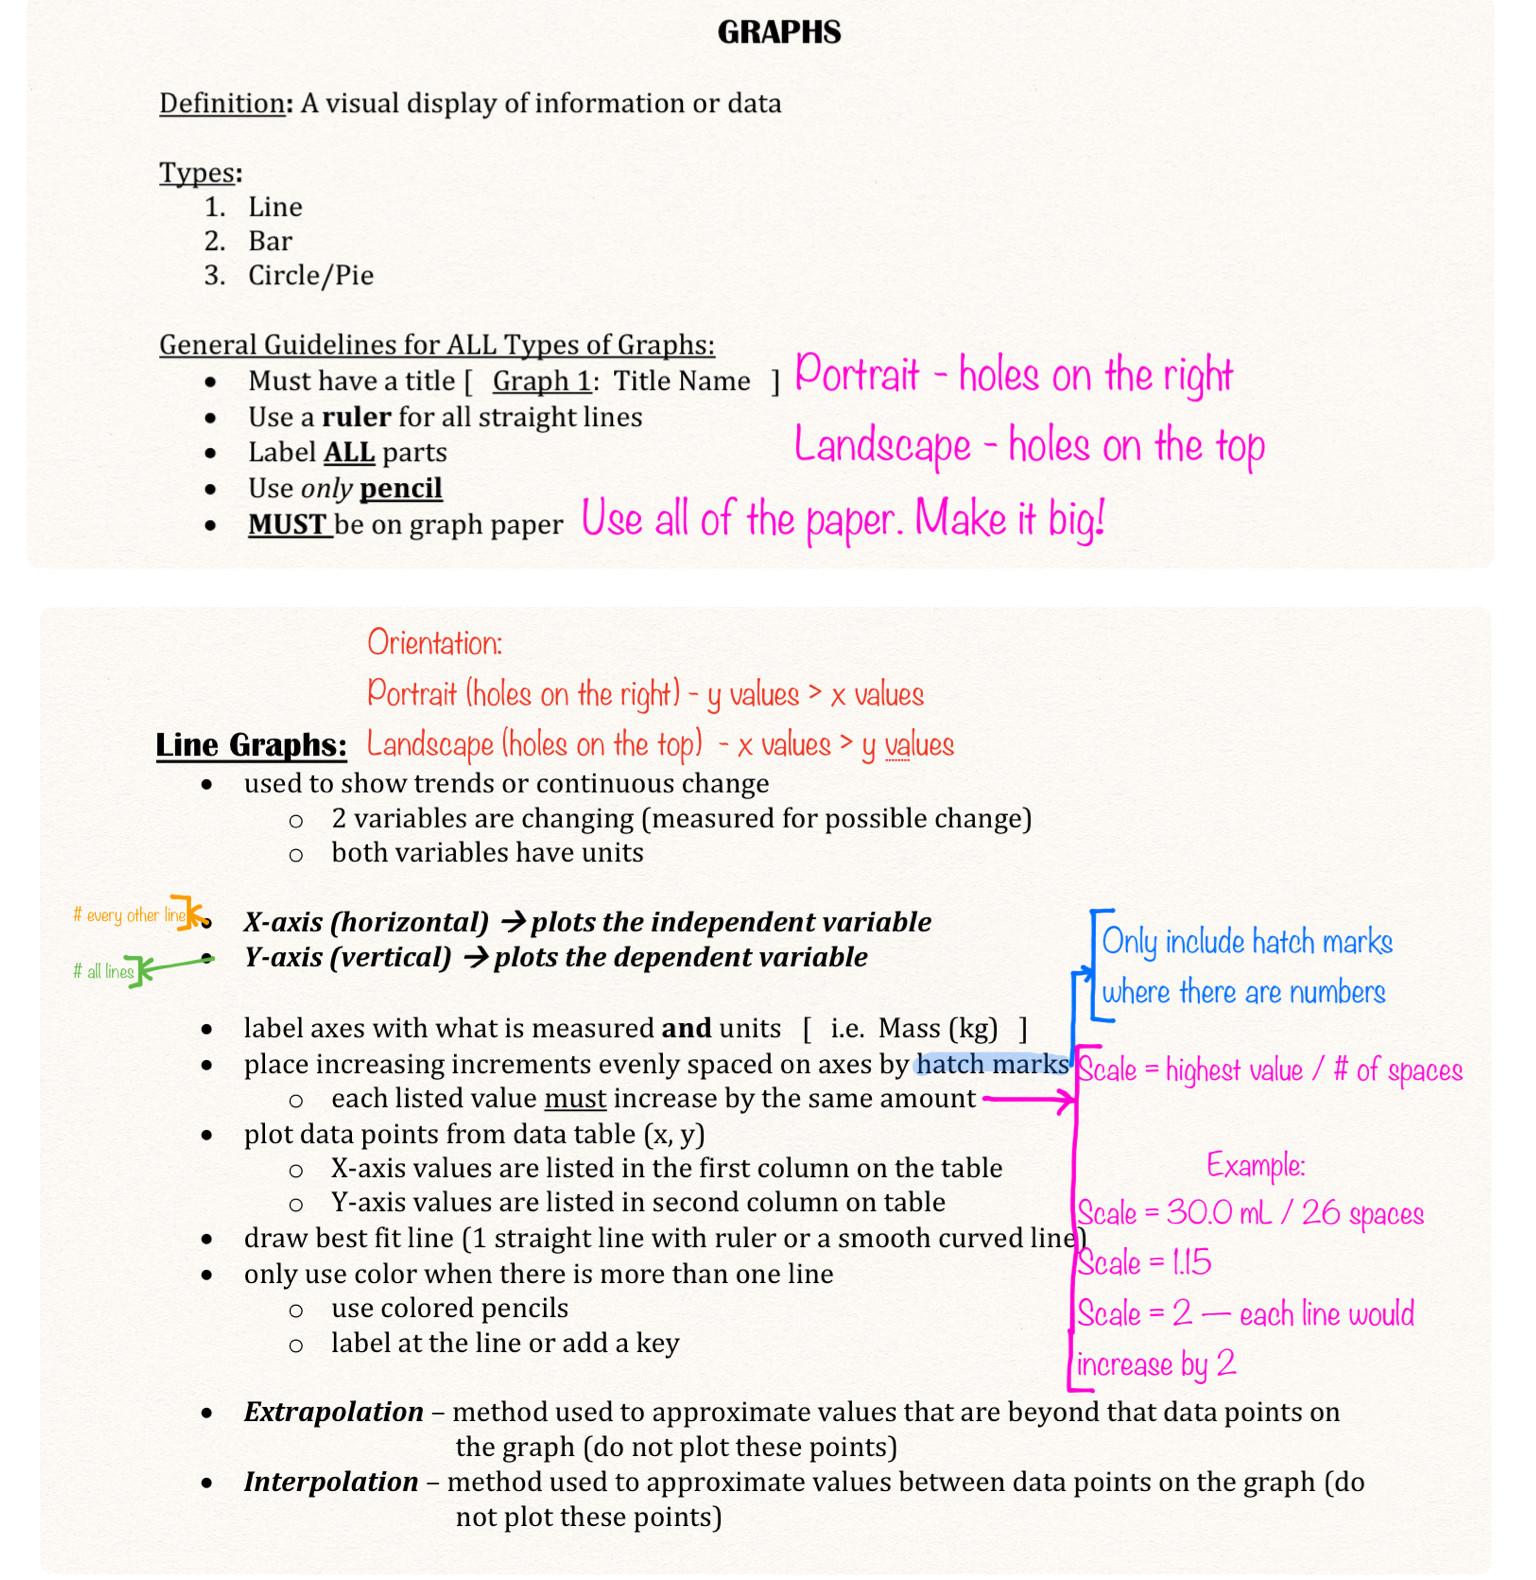 Worksheet for Basic Stoichiometry Answer